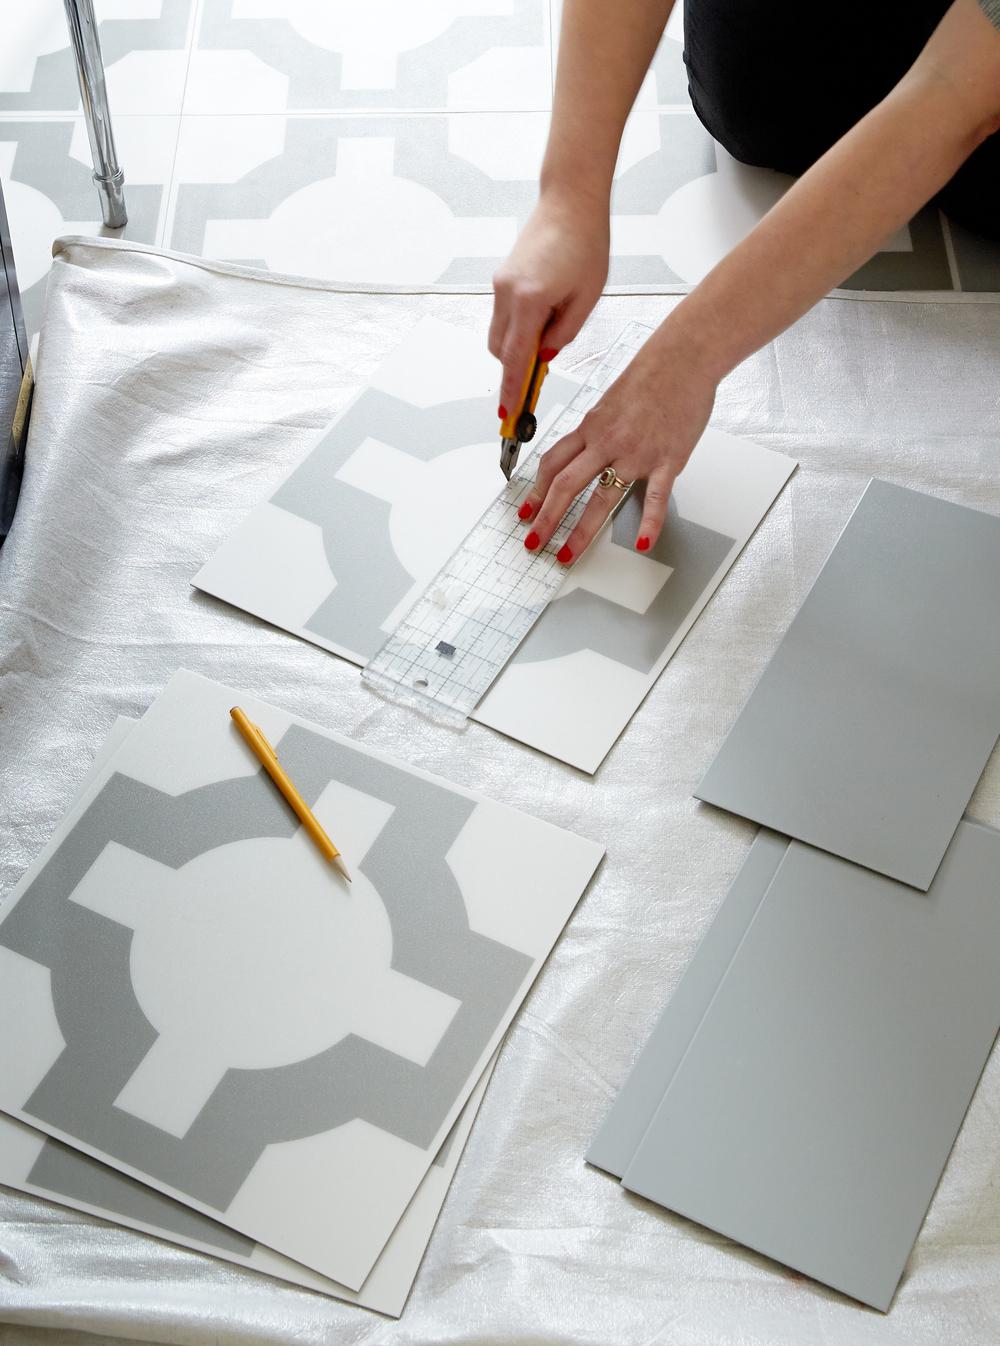 How To: Prepare your floor for installing vinyl tiles